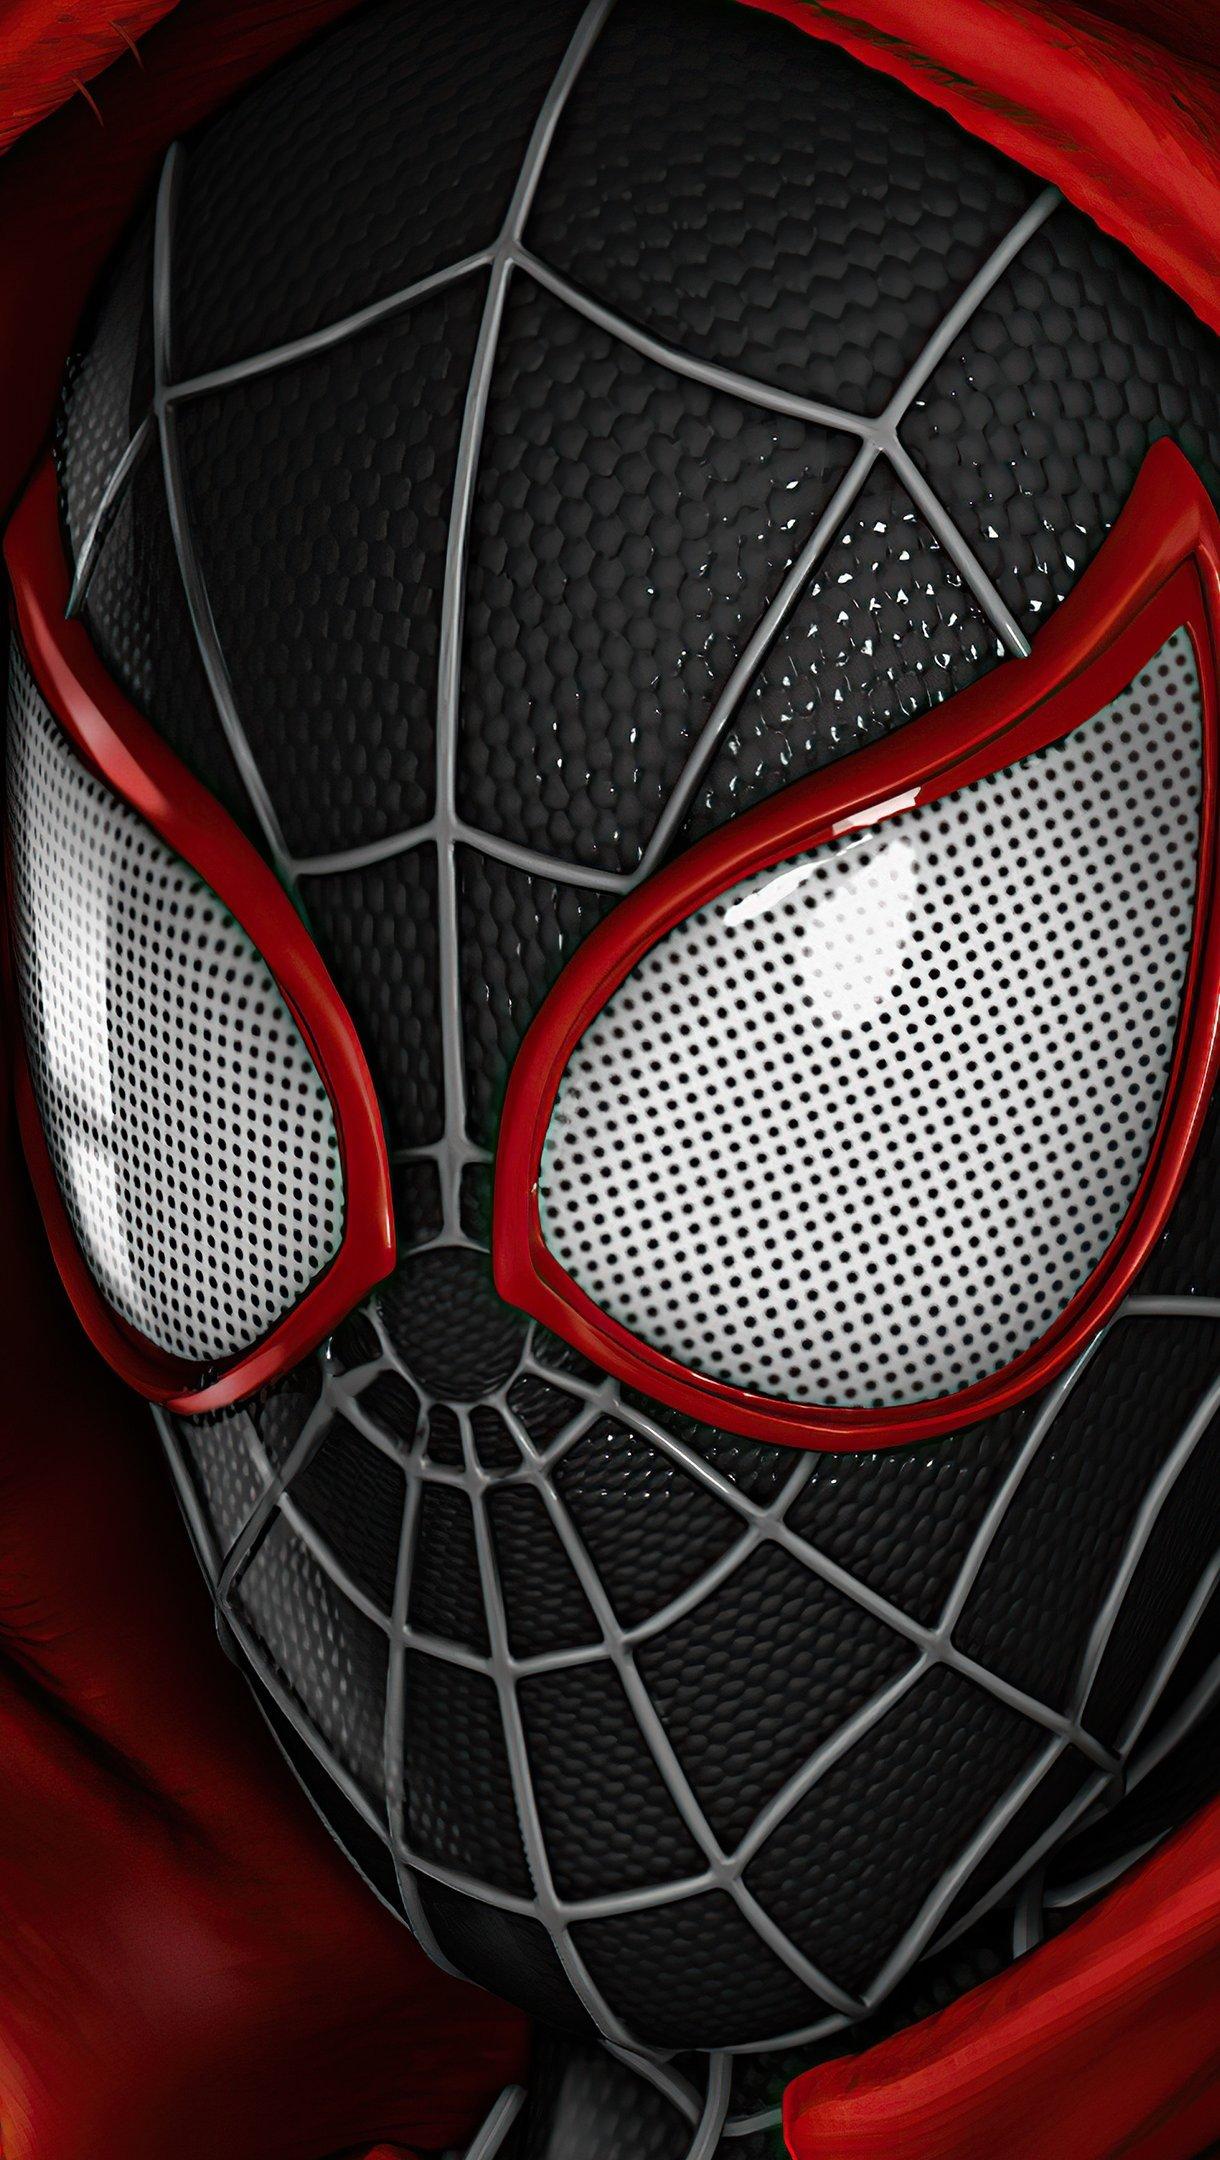 Wallpaper Spiderman Miles Morales Vertical